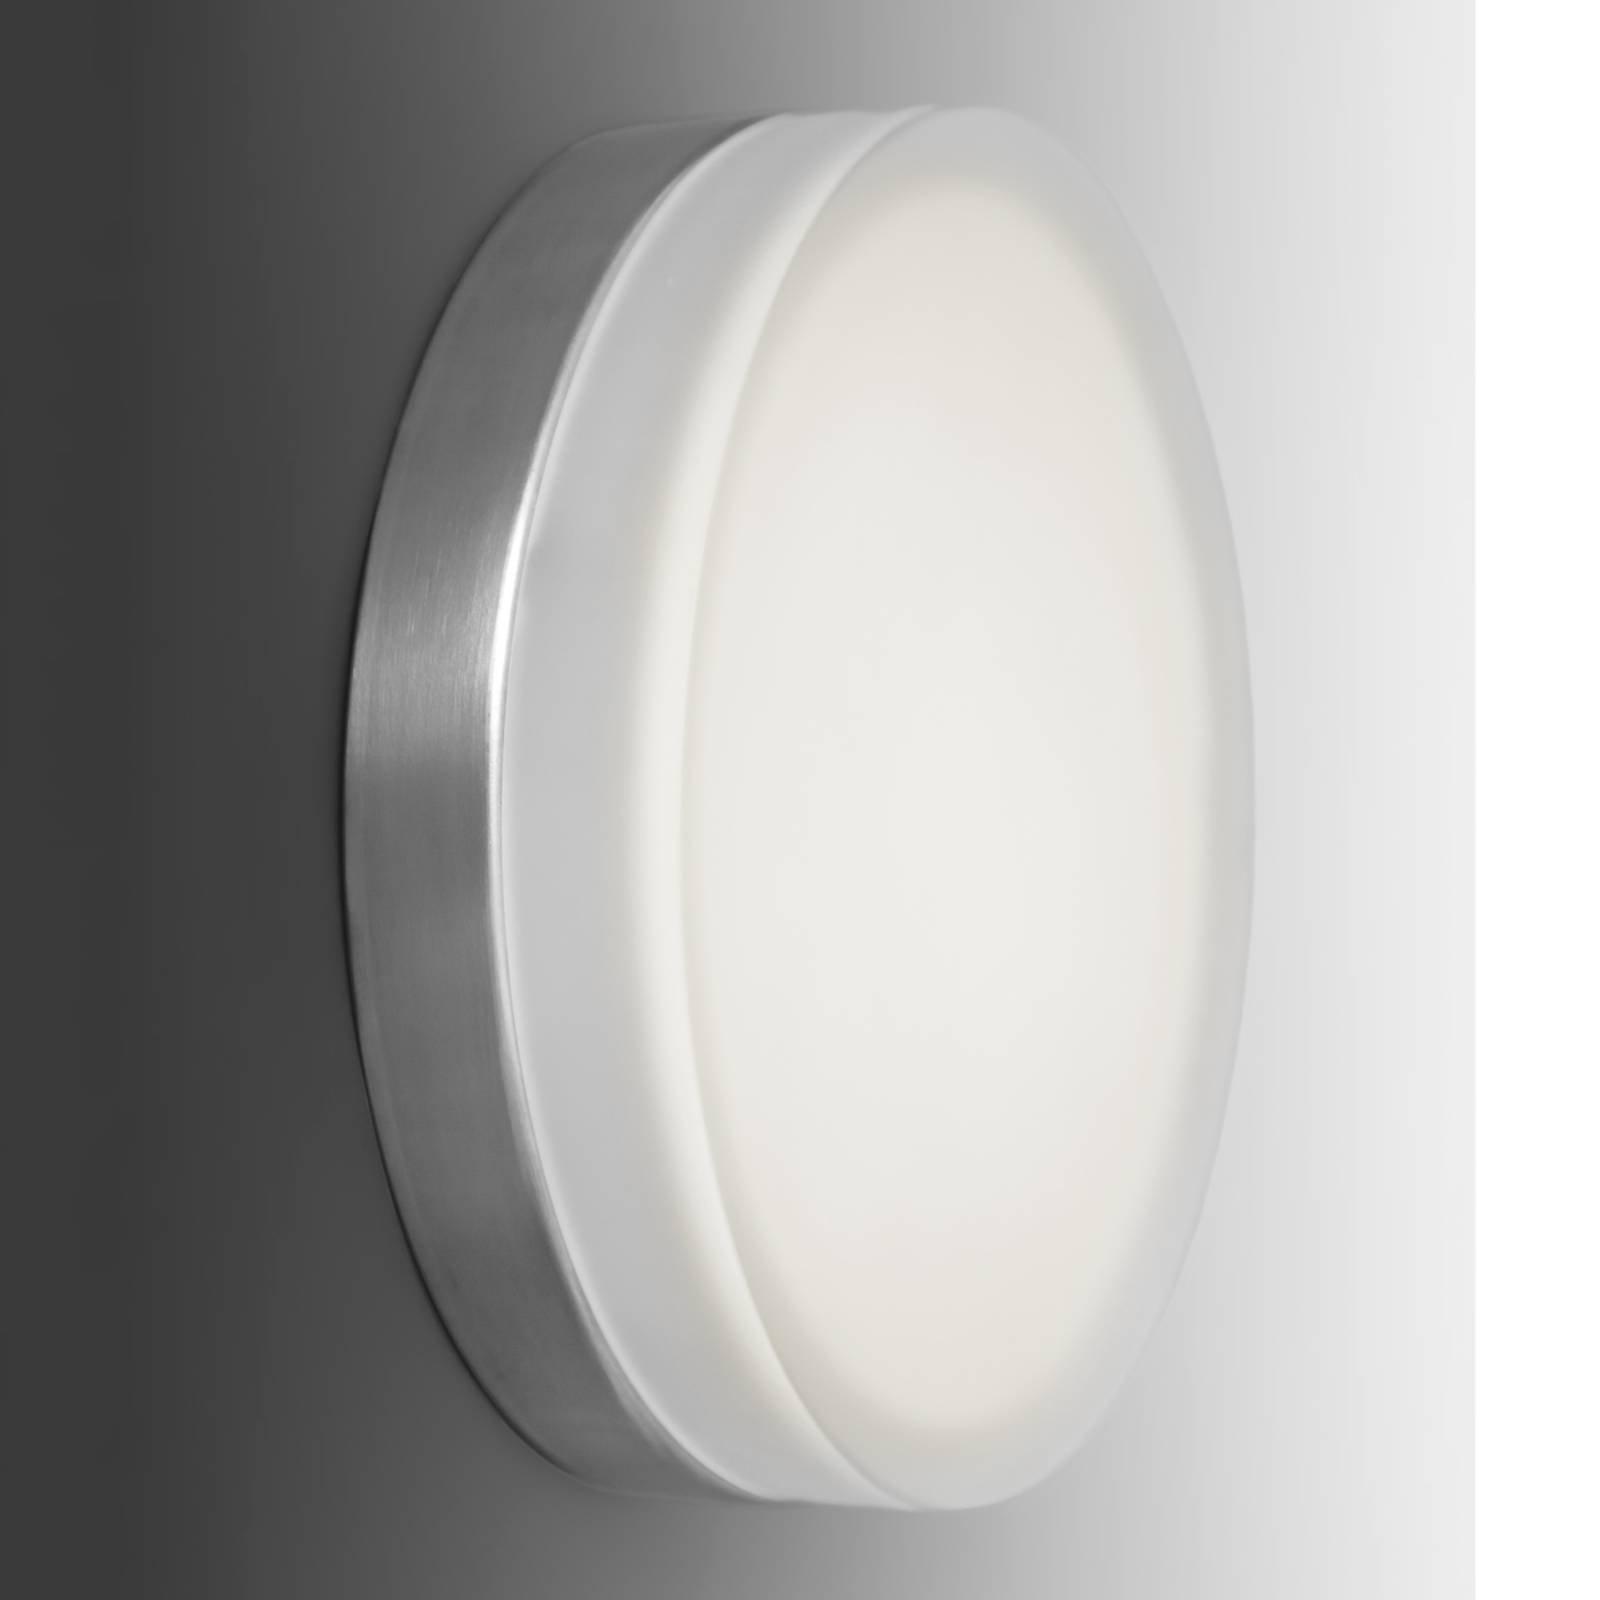 Enkel, rund LED-vegglampe Briq 01, 3 000 K